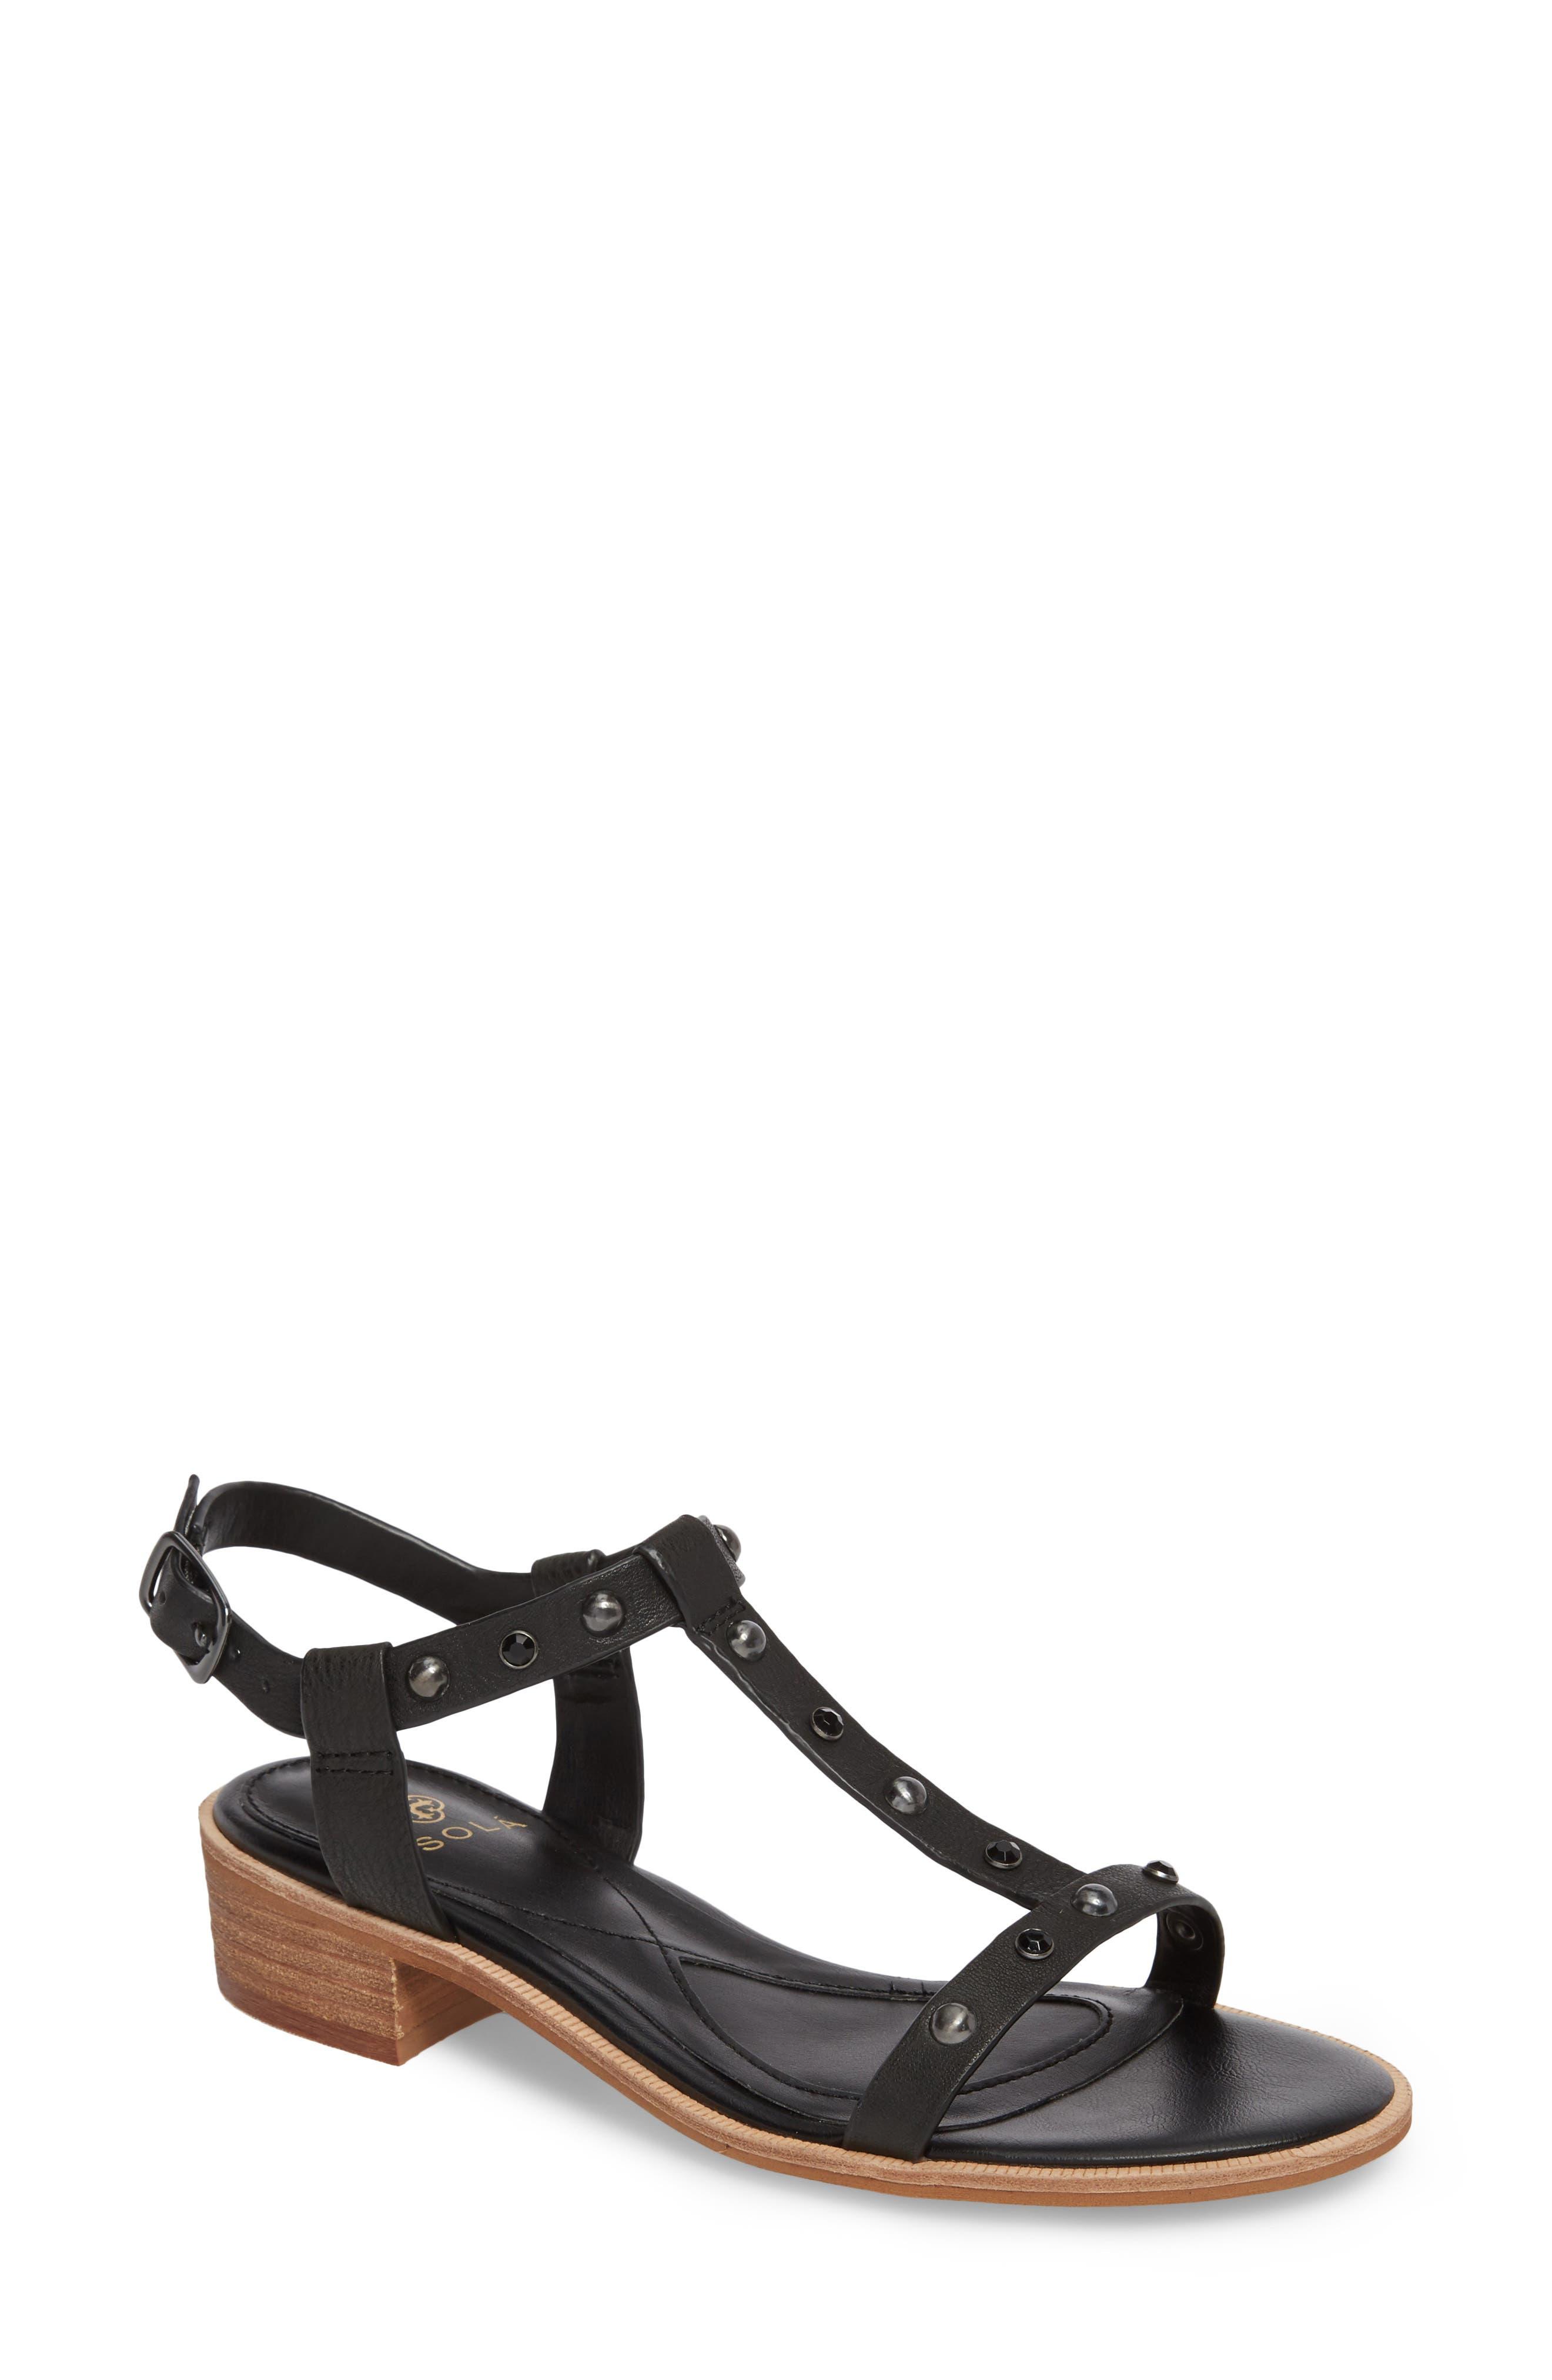 Giana Studded Sandal,                         Main,                         color, BLACK LEATHER